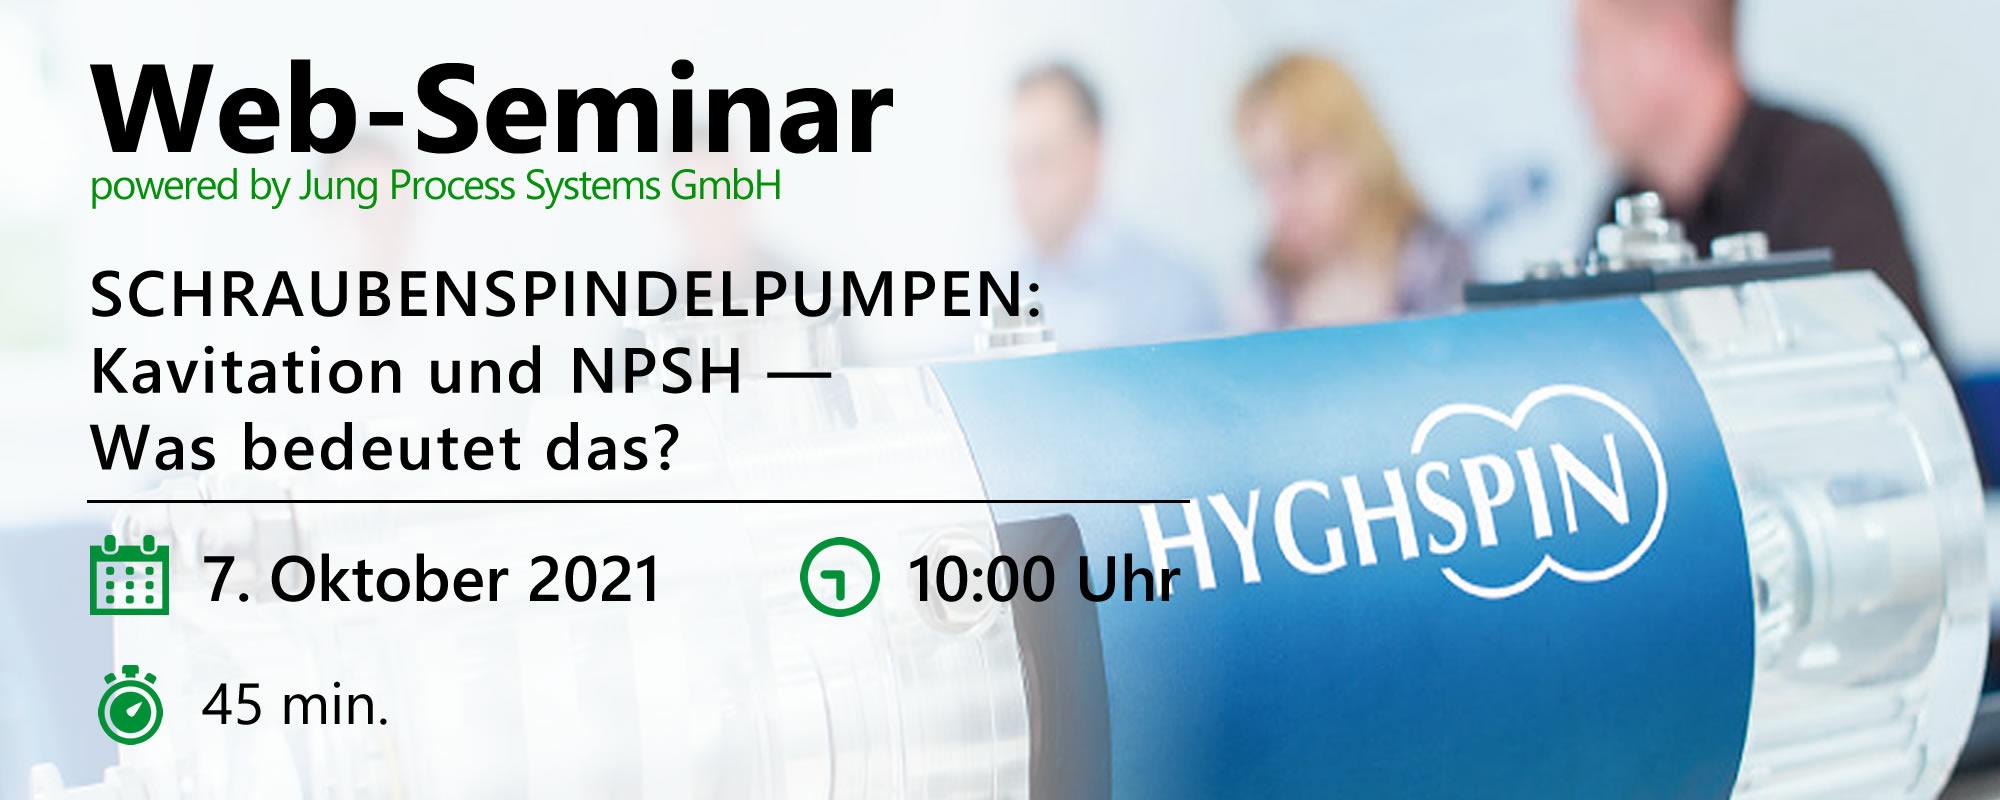 Web-Seminar am 07.10.2021